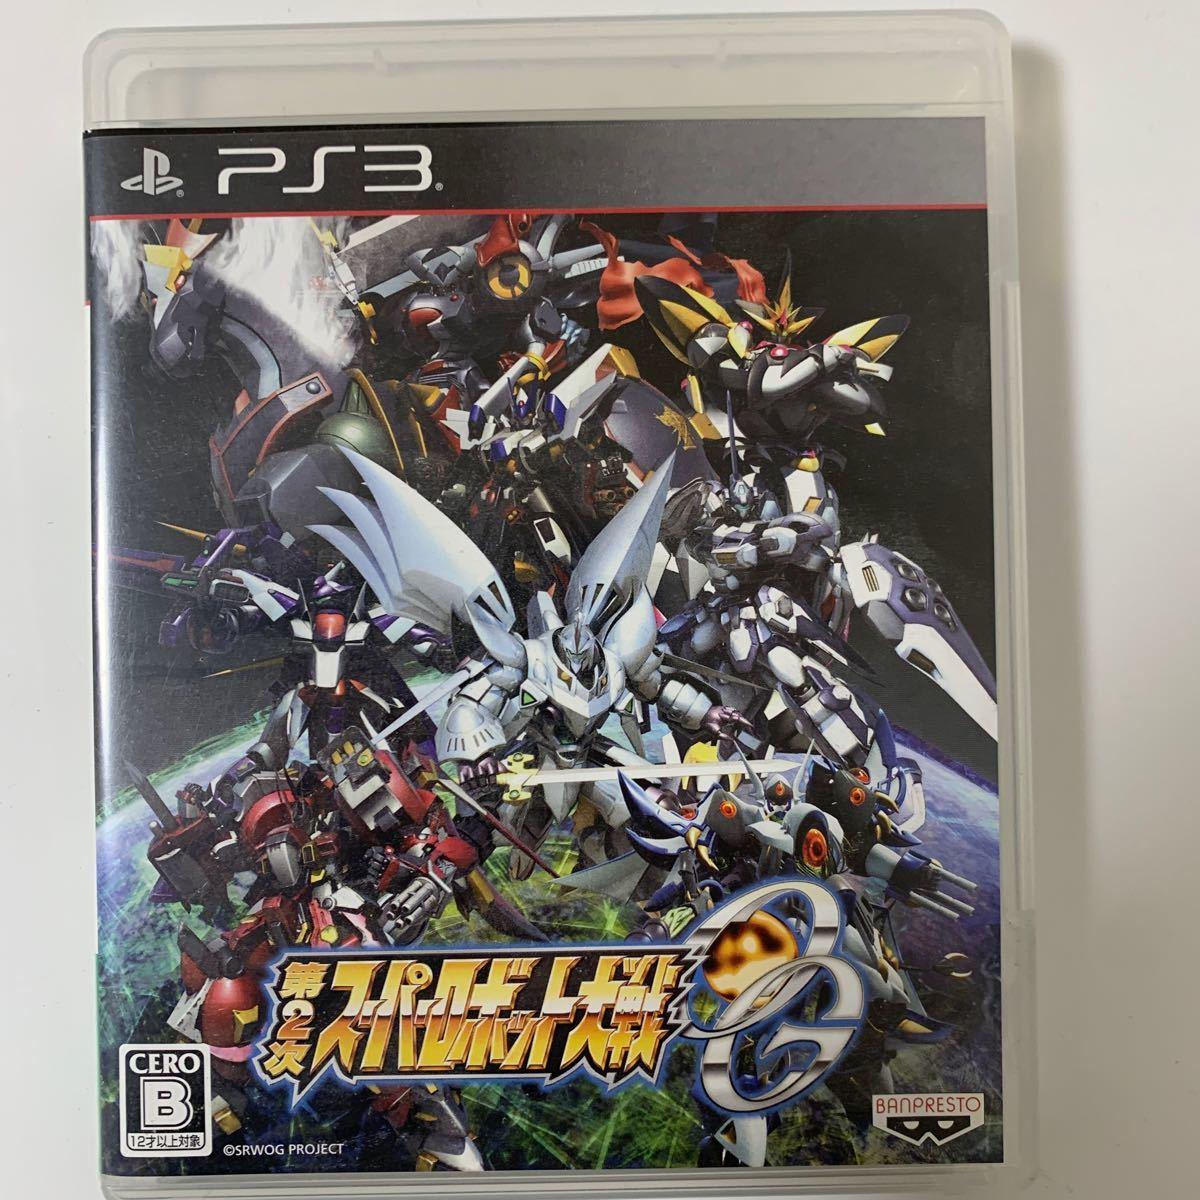 【PS3】 第2次スーパーロボット大戦OG [通常版]ジャンク品